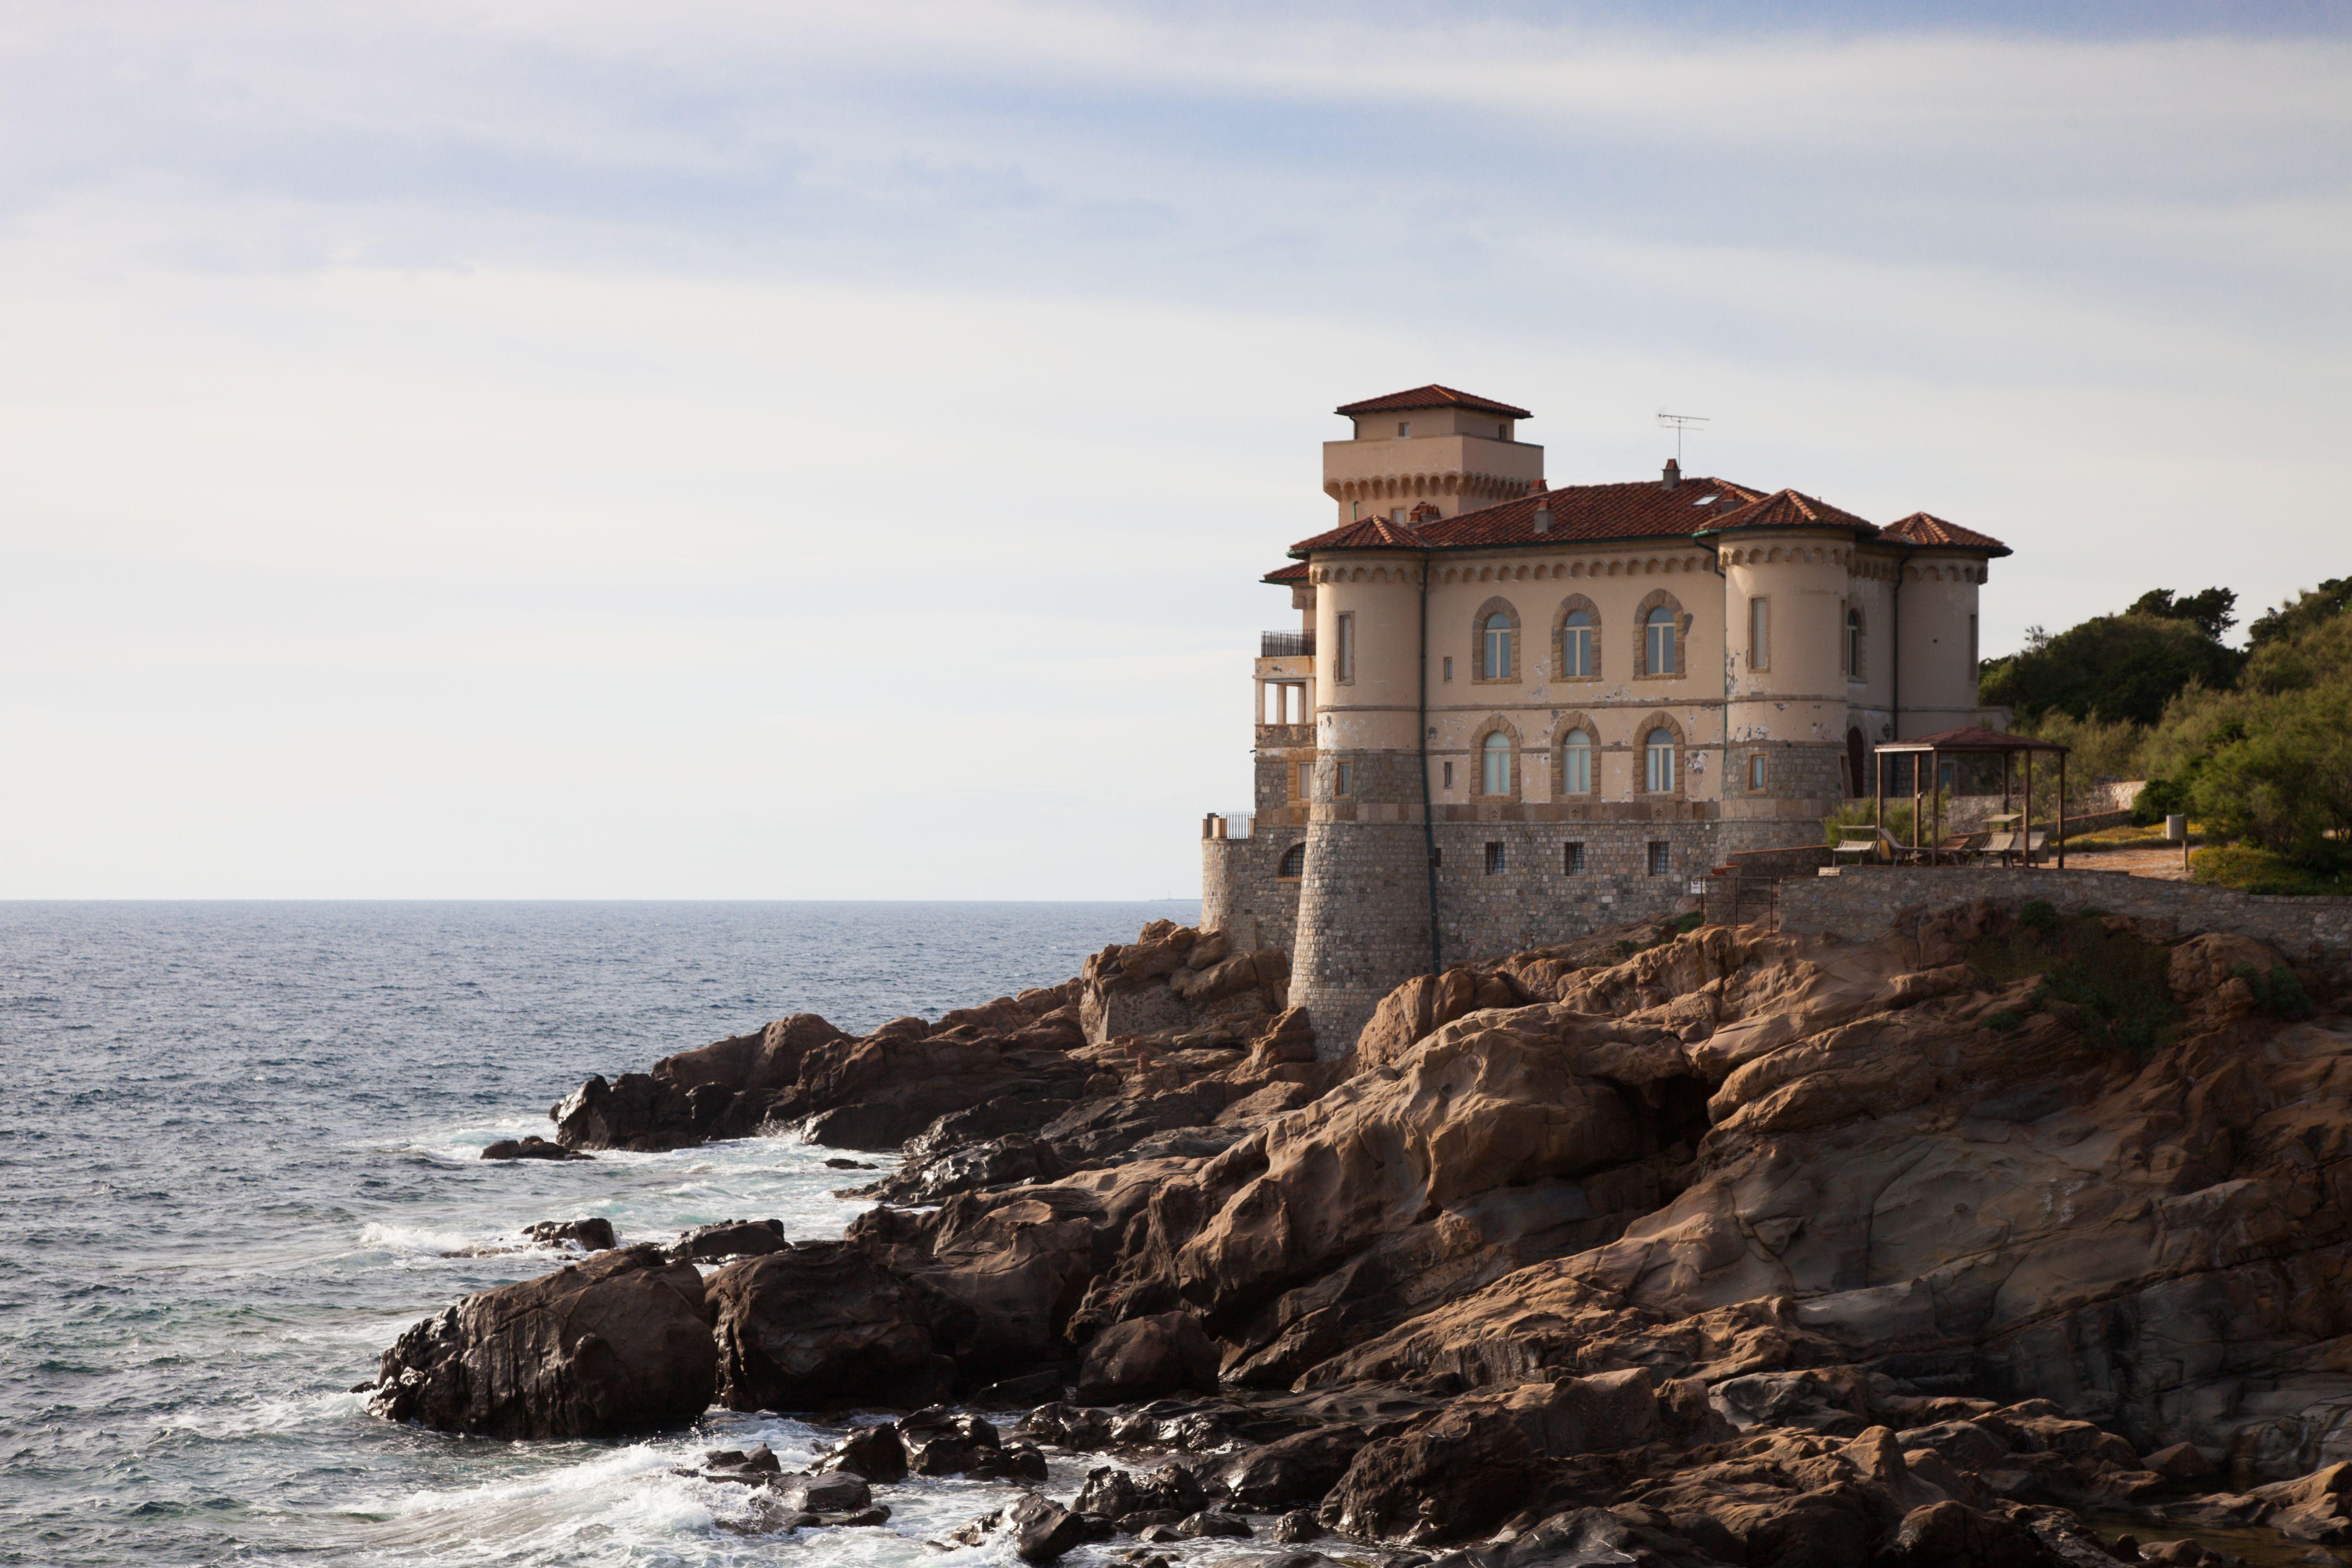 Castle on cliff near seashore